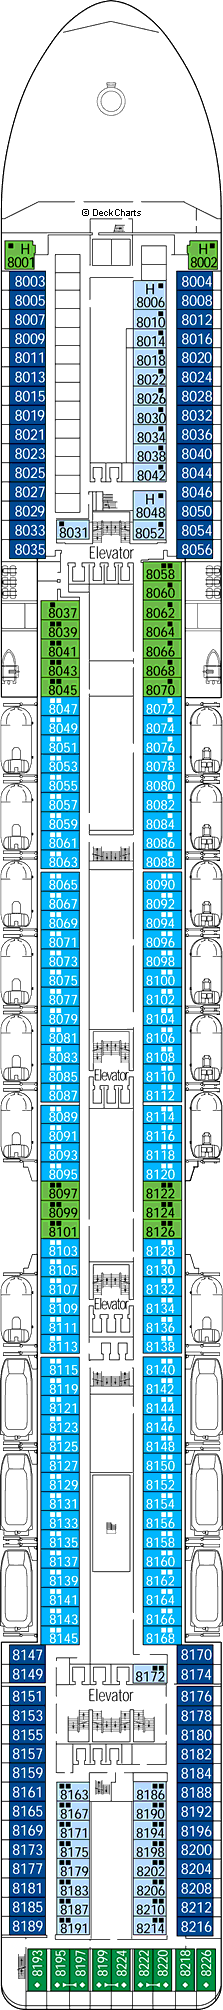 MSC Magnifica: Deck 8